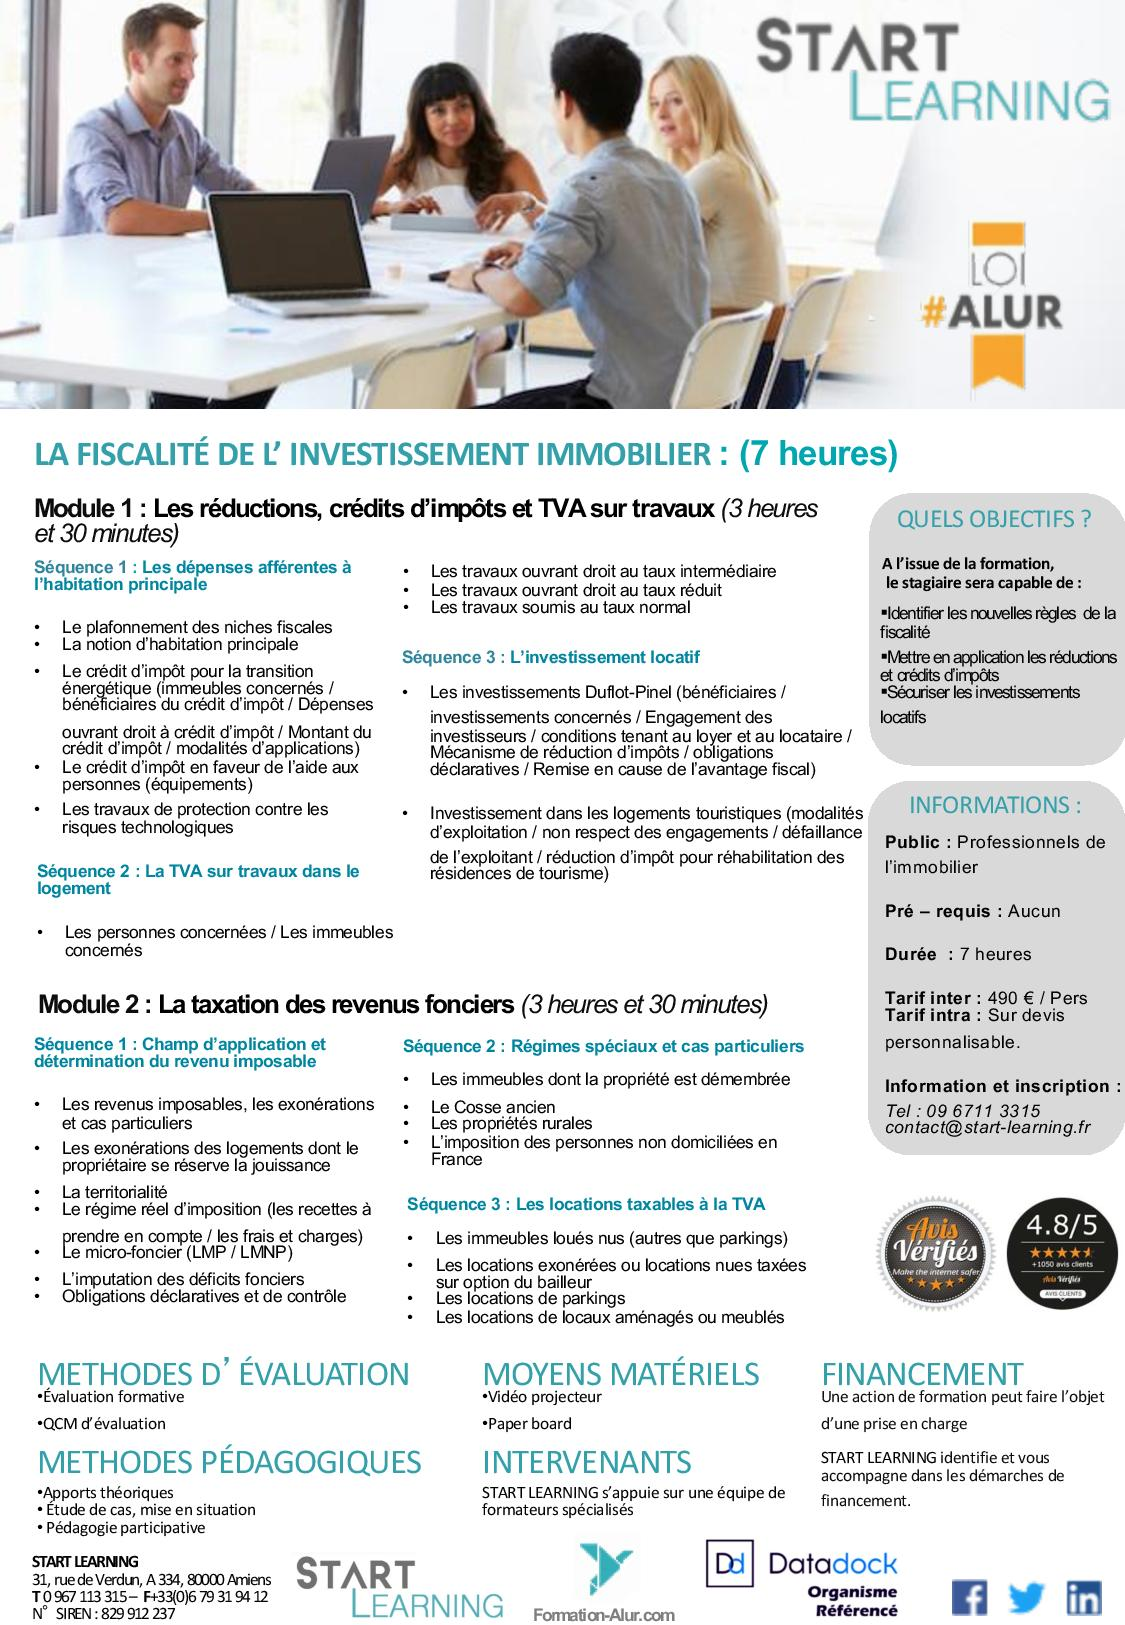 Programme Formation alur agents immobiliers - Fiscalité (1J)